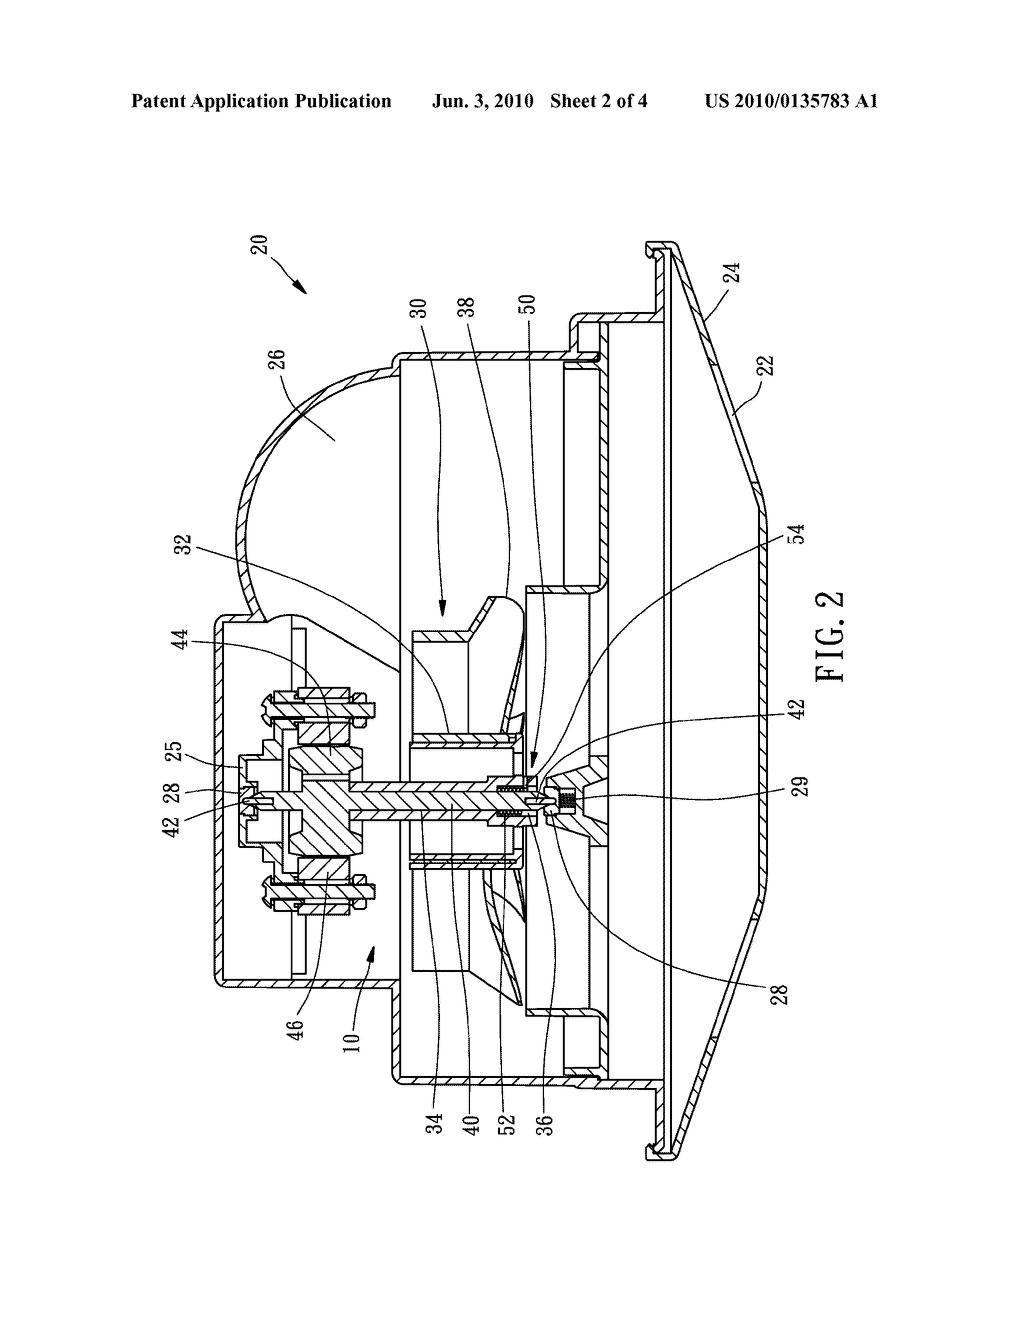 2002 subaru outback exhaust diagram dsc keypad wiring h6 3 2004 engine 6 cylinder